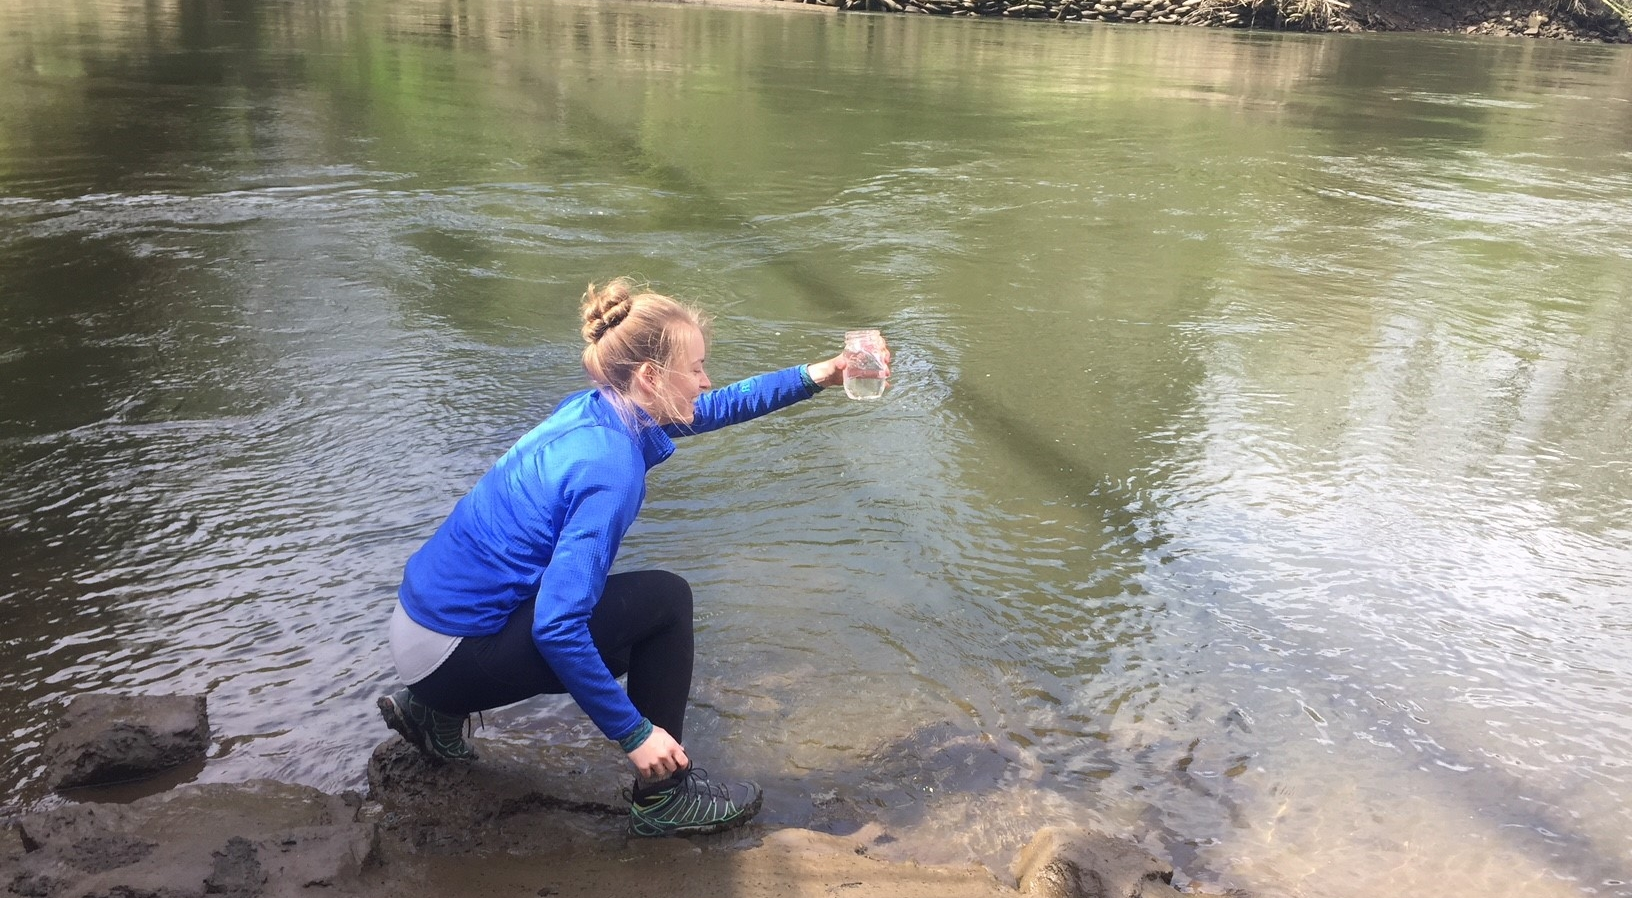 Corrine Armistead takes a water sample as part of a regional microplastics survey.